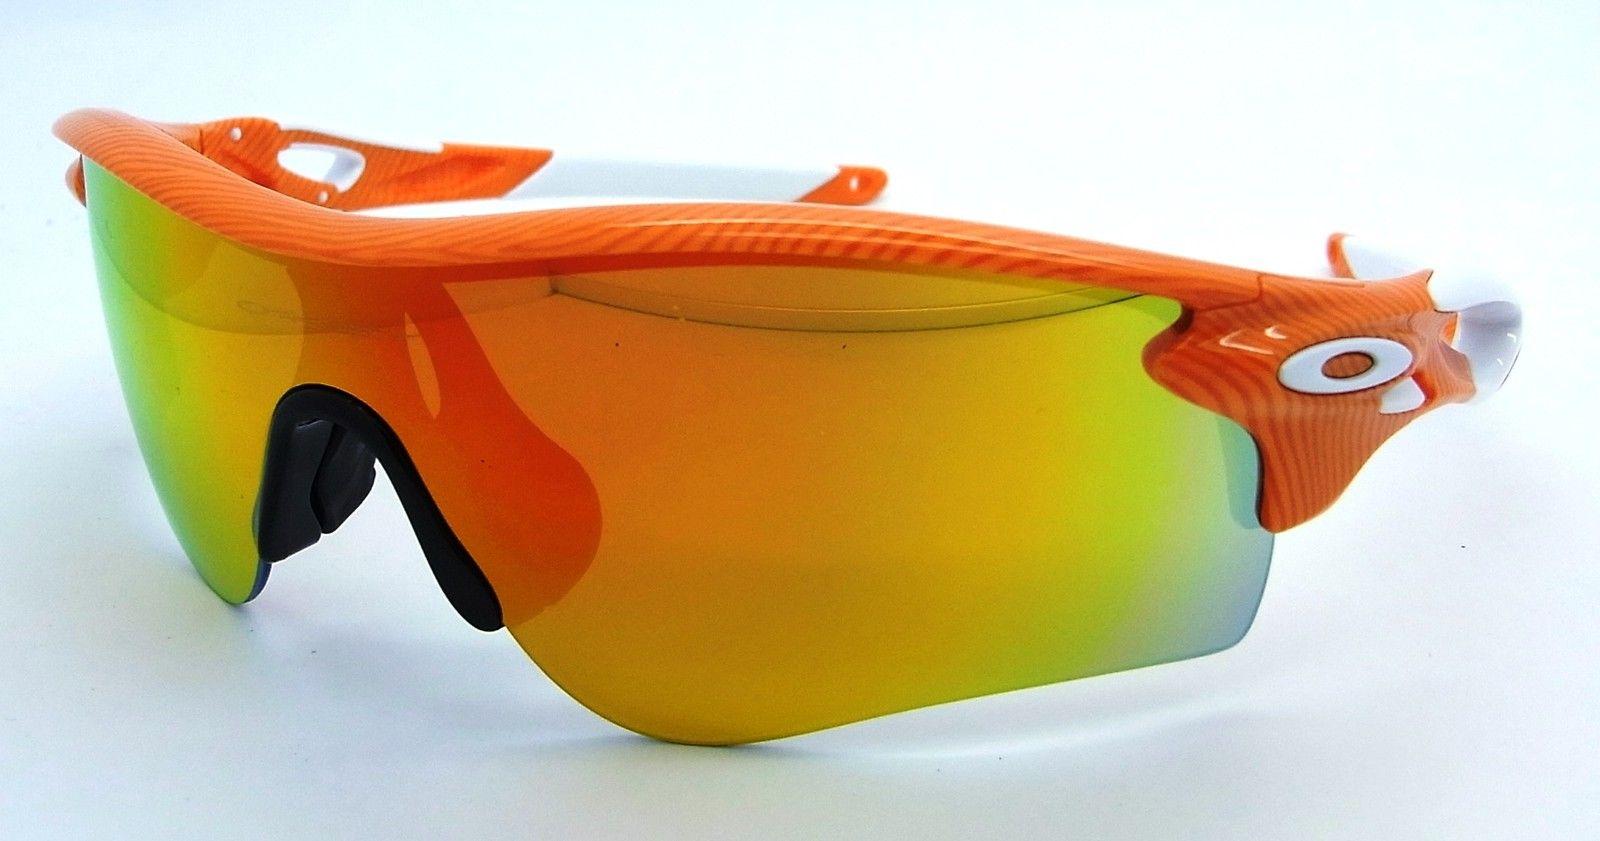 oakley radarlock path lunettes de soleil empreintes digitales orange w feu noir. Black Bedroom Furniture Sets. Home Design Ideas